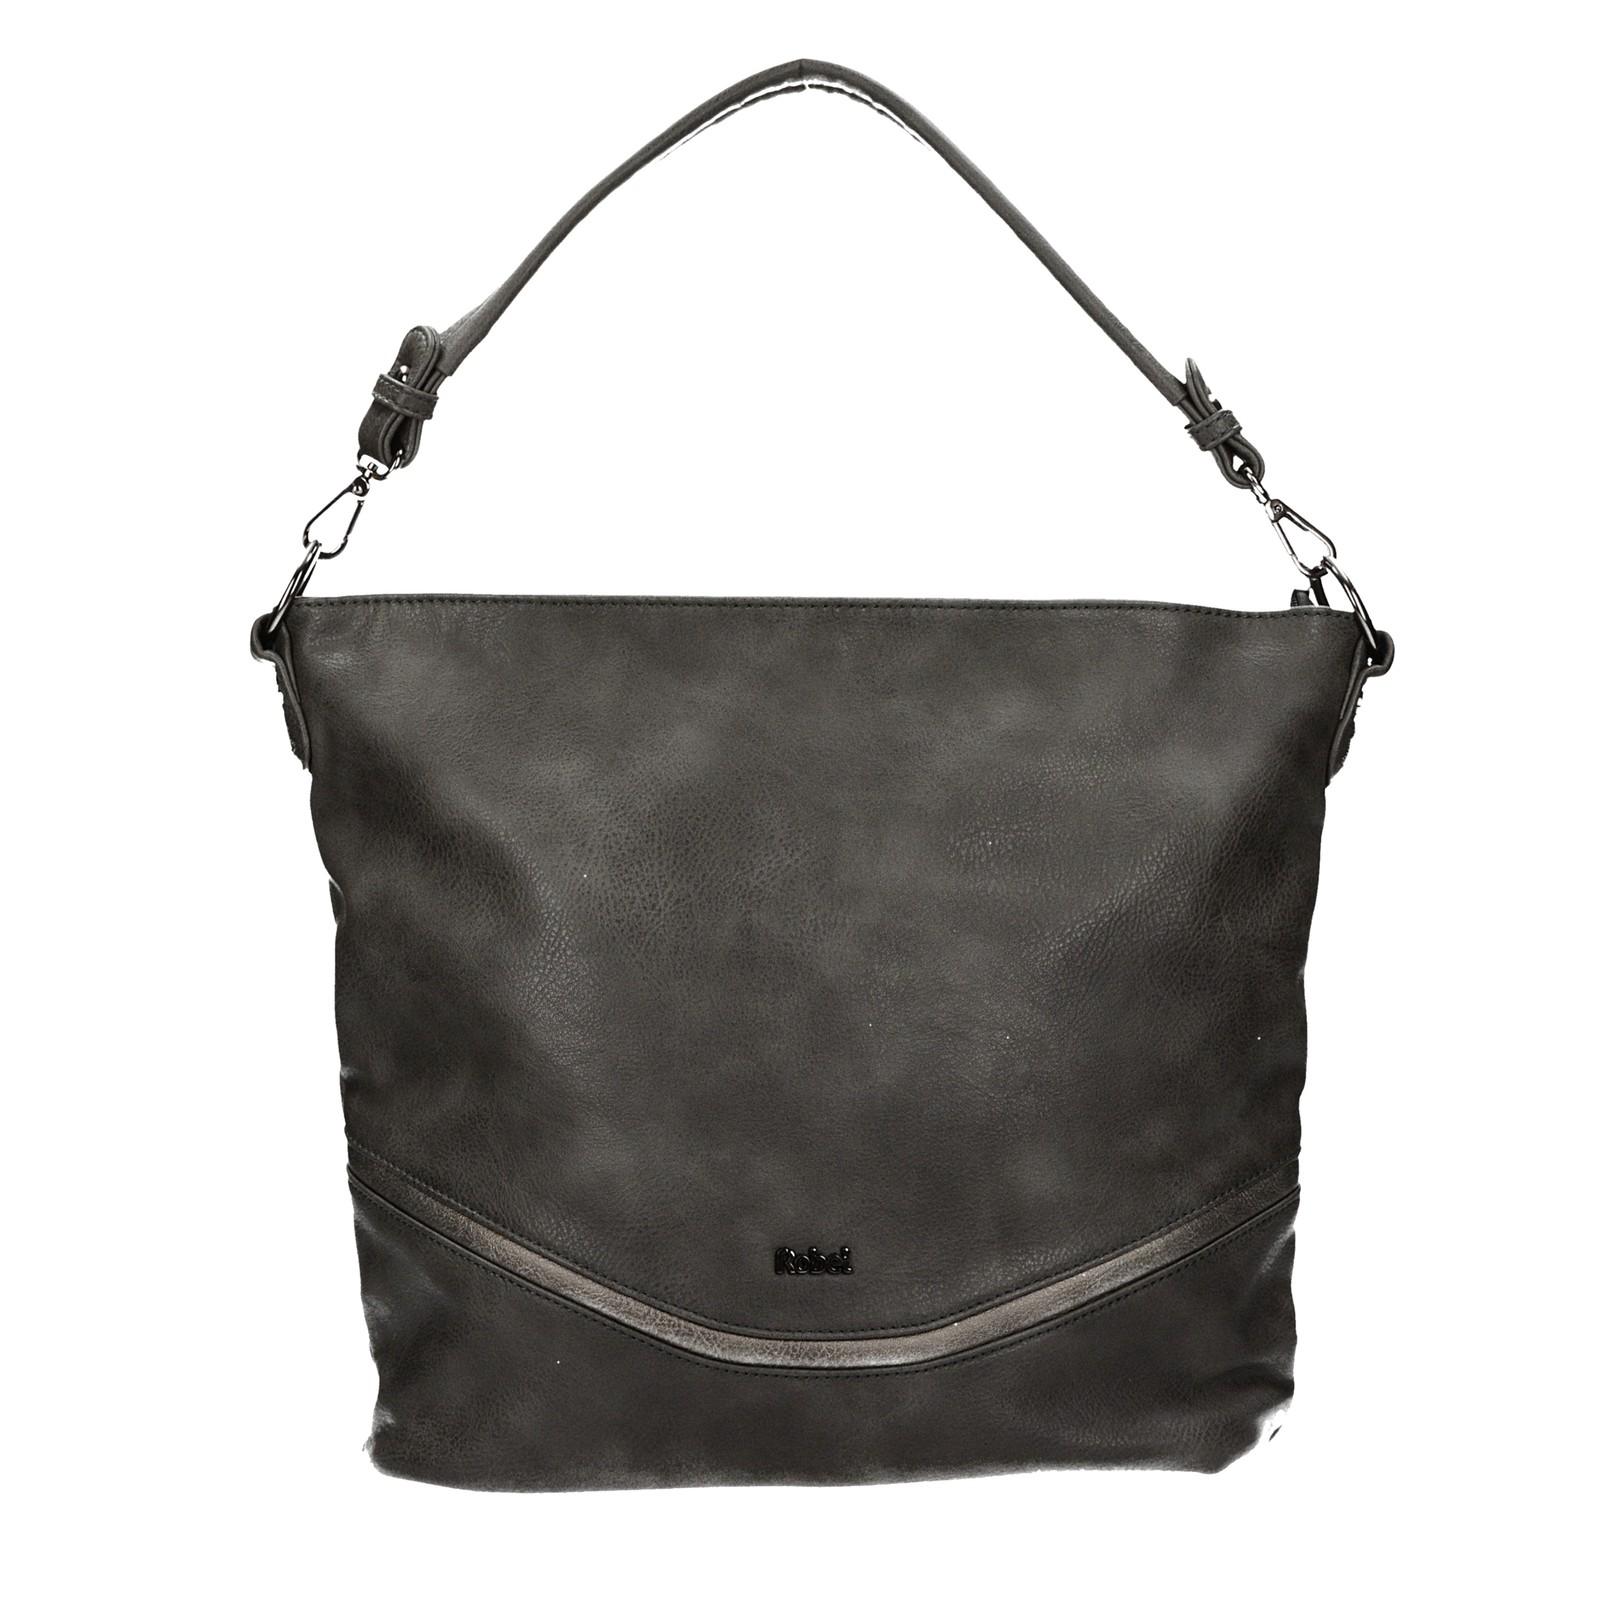 Robel dámska štýlová kabelka - tmavošedá